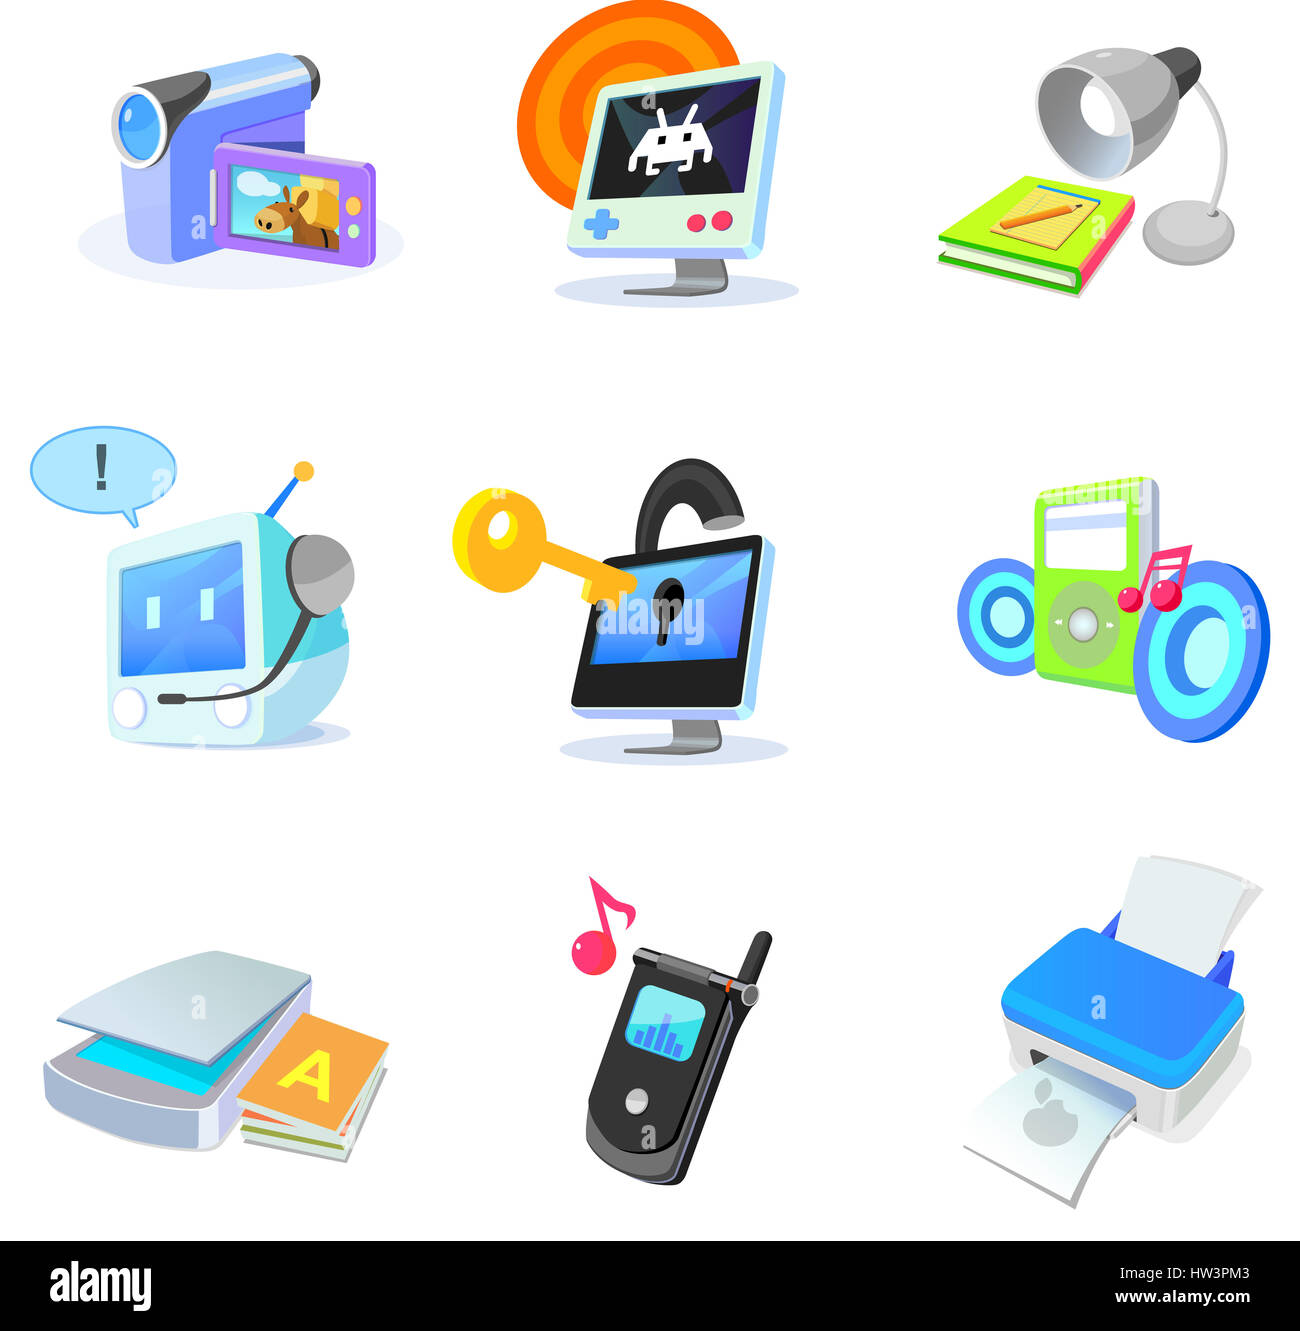 Book Cartoon clipart - Book, Communication, Rectangle, transparent clip art